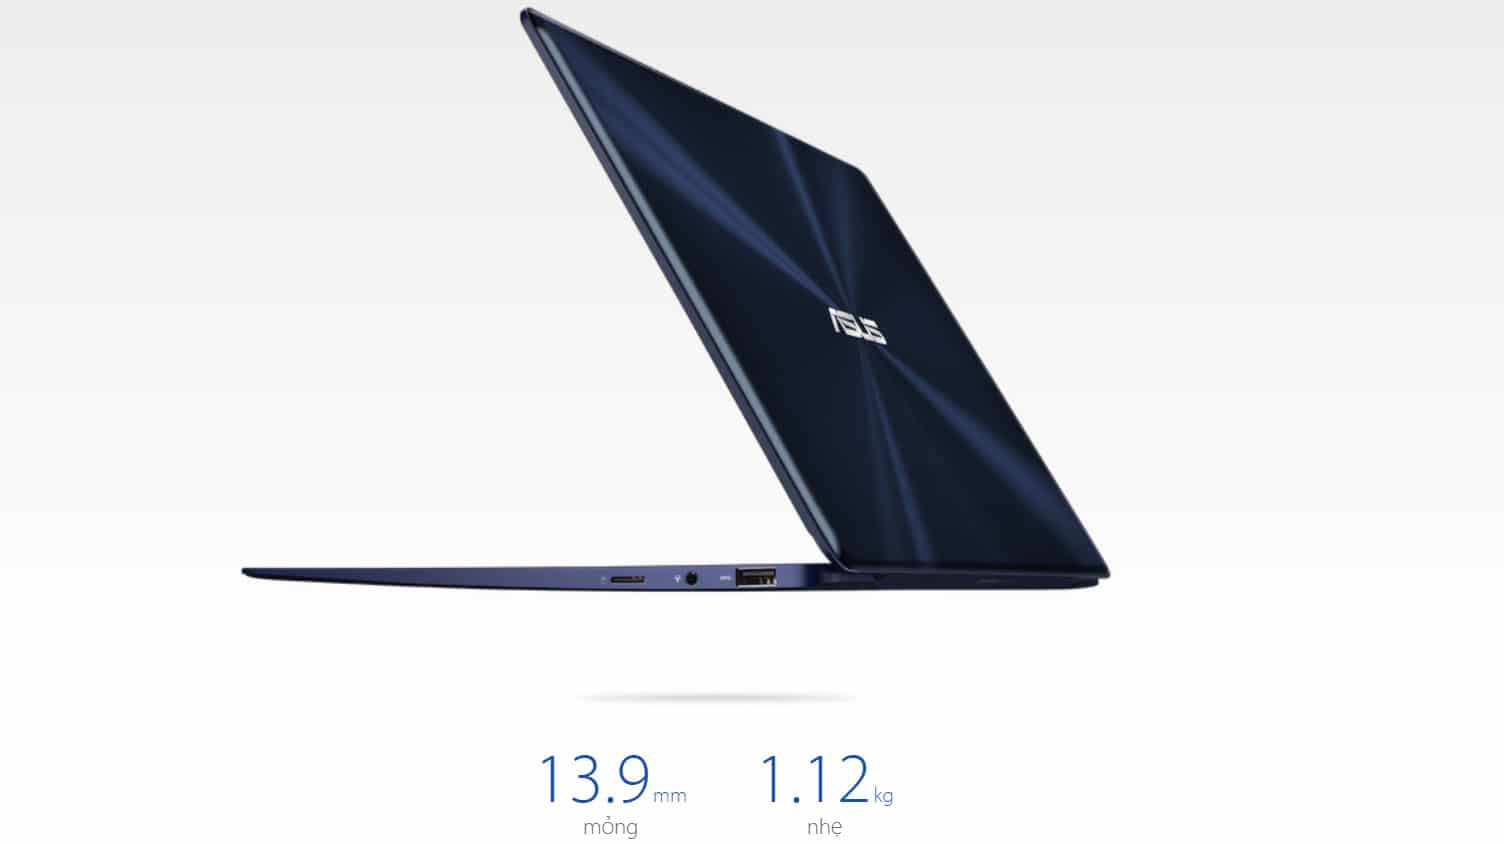 ASUS ZenBook 13 UX331UN – Mỏng nhẹ, tinh tế, sang trọng - 278852